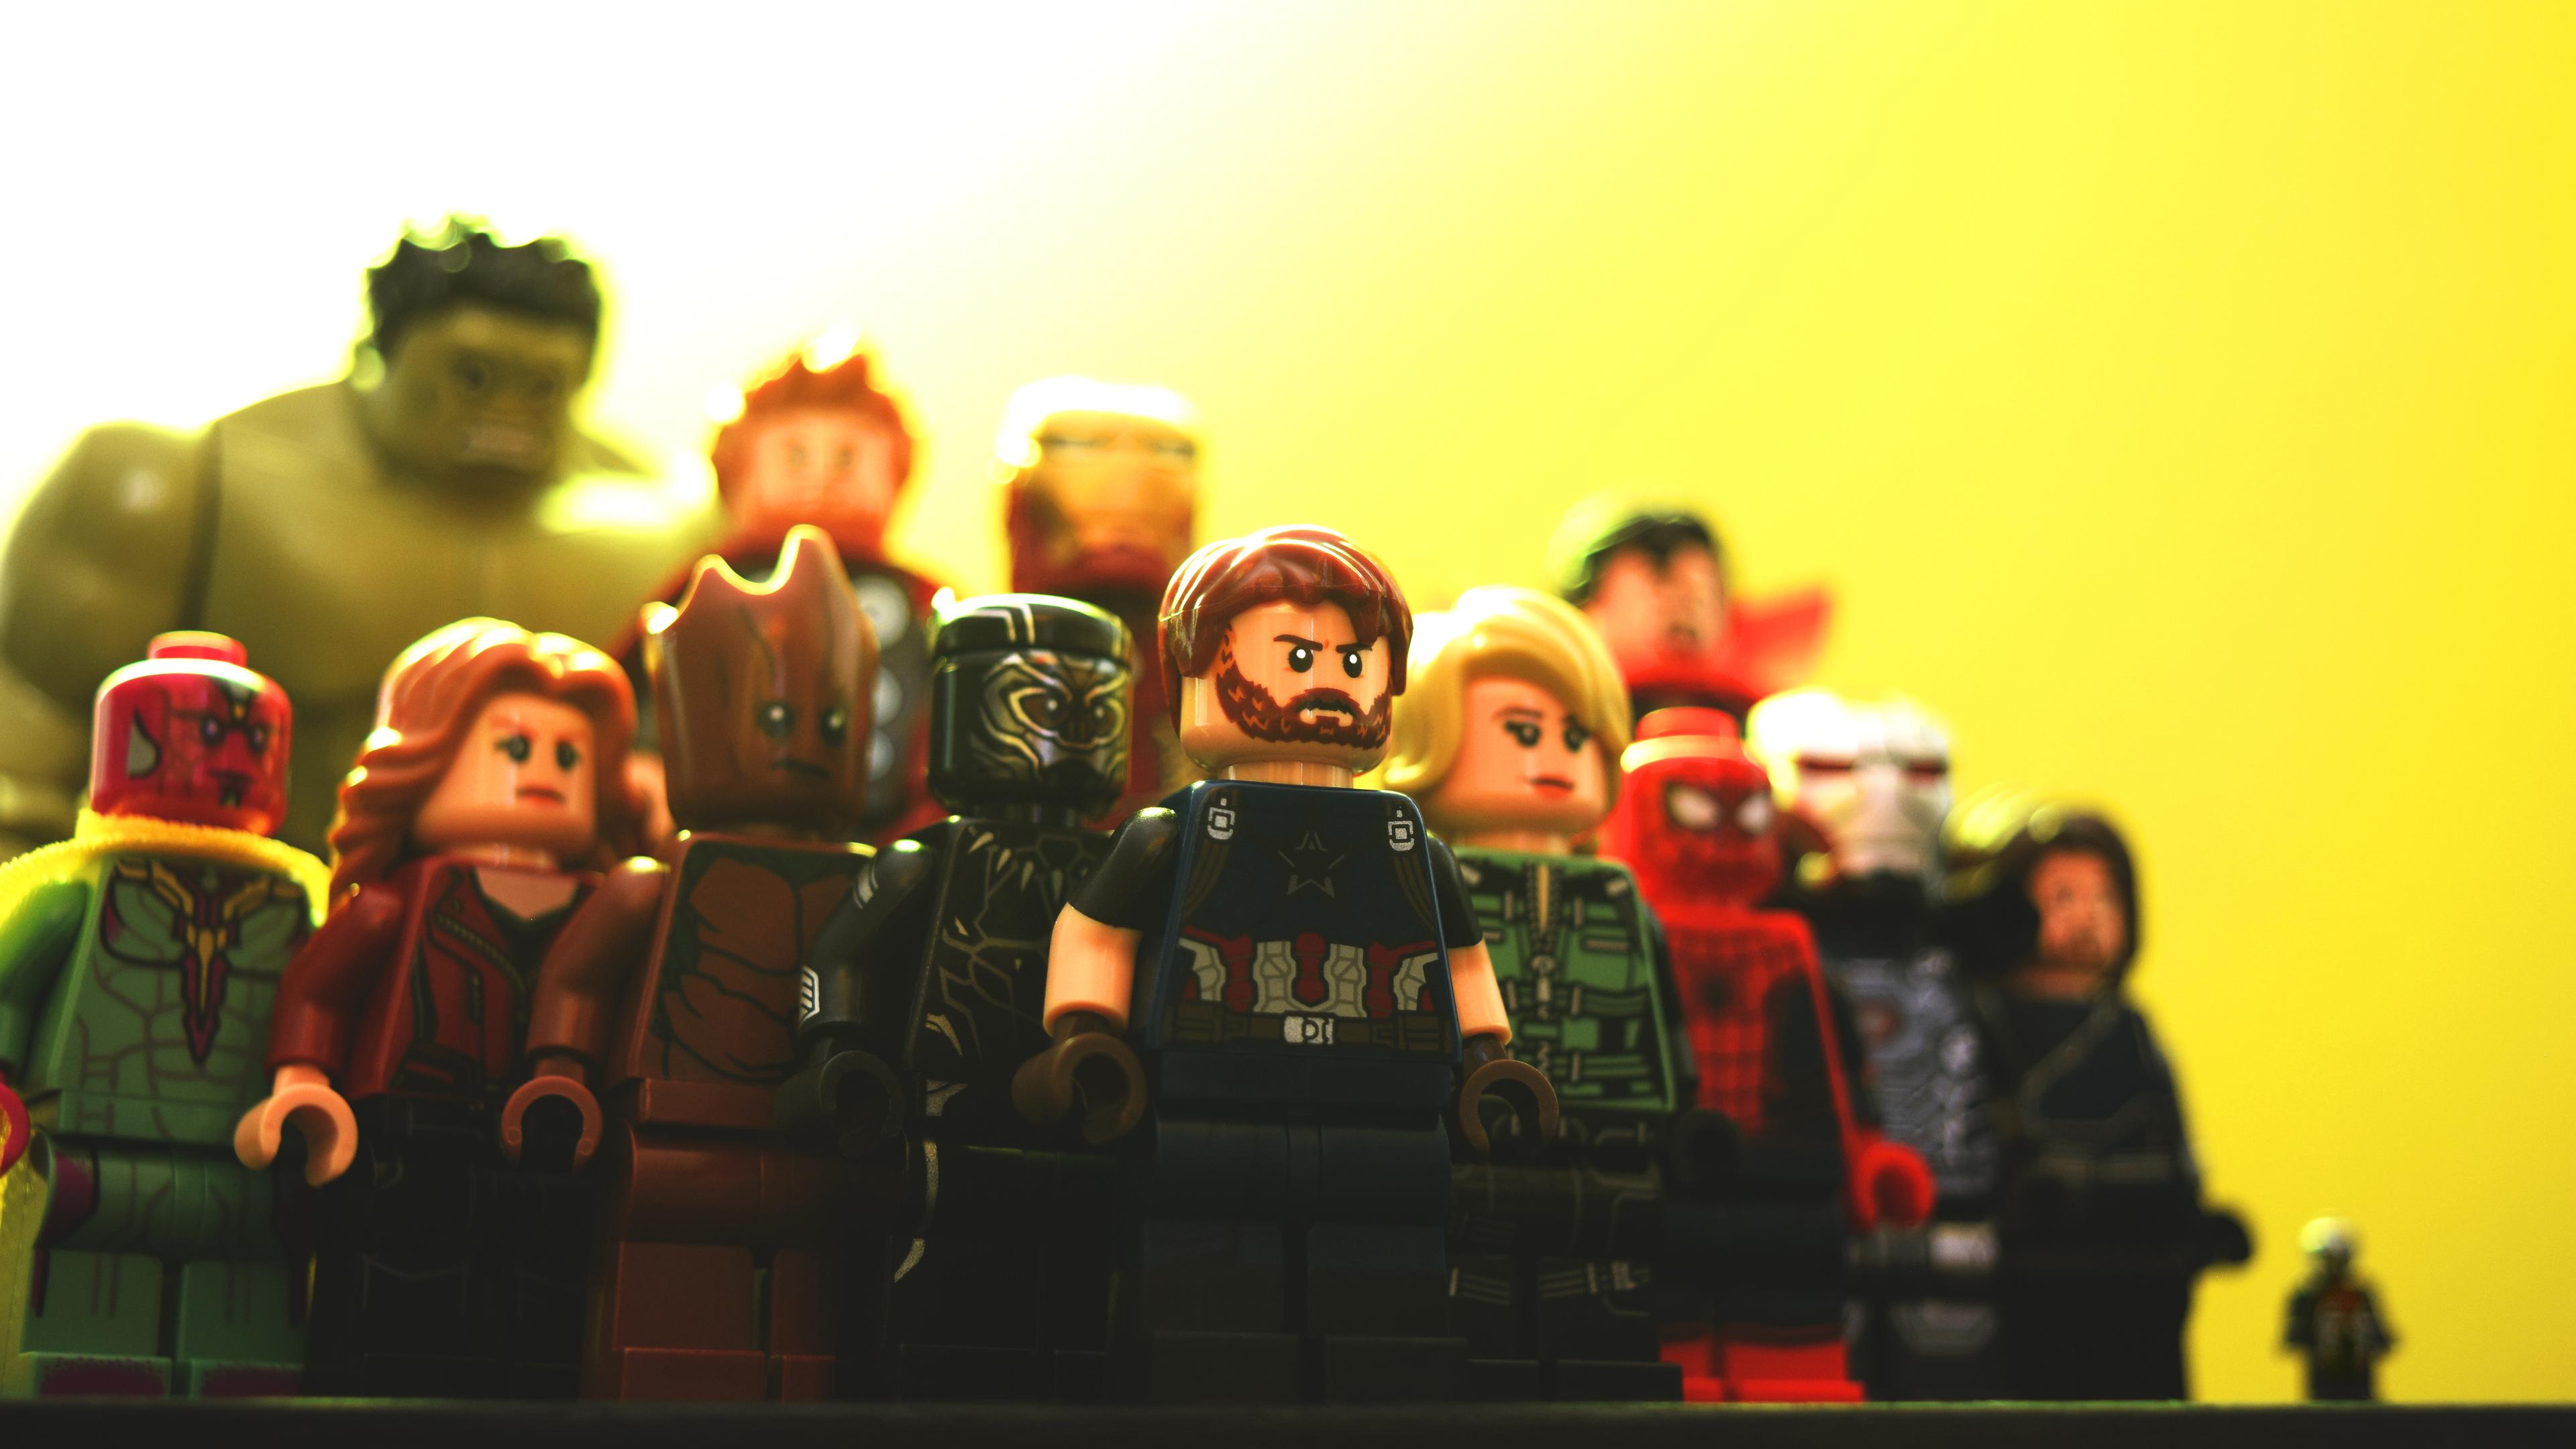 Wallpaper 4k Avengers Infinity War Lego Art 4k Wallpapers 5k